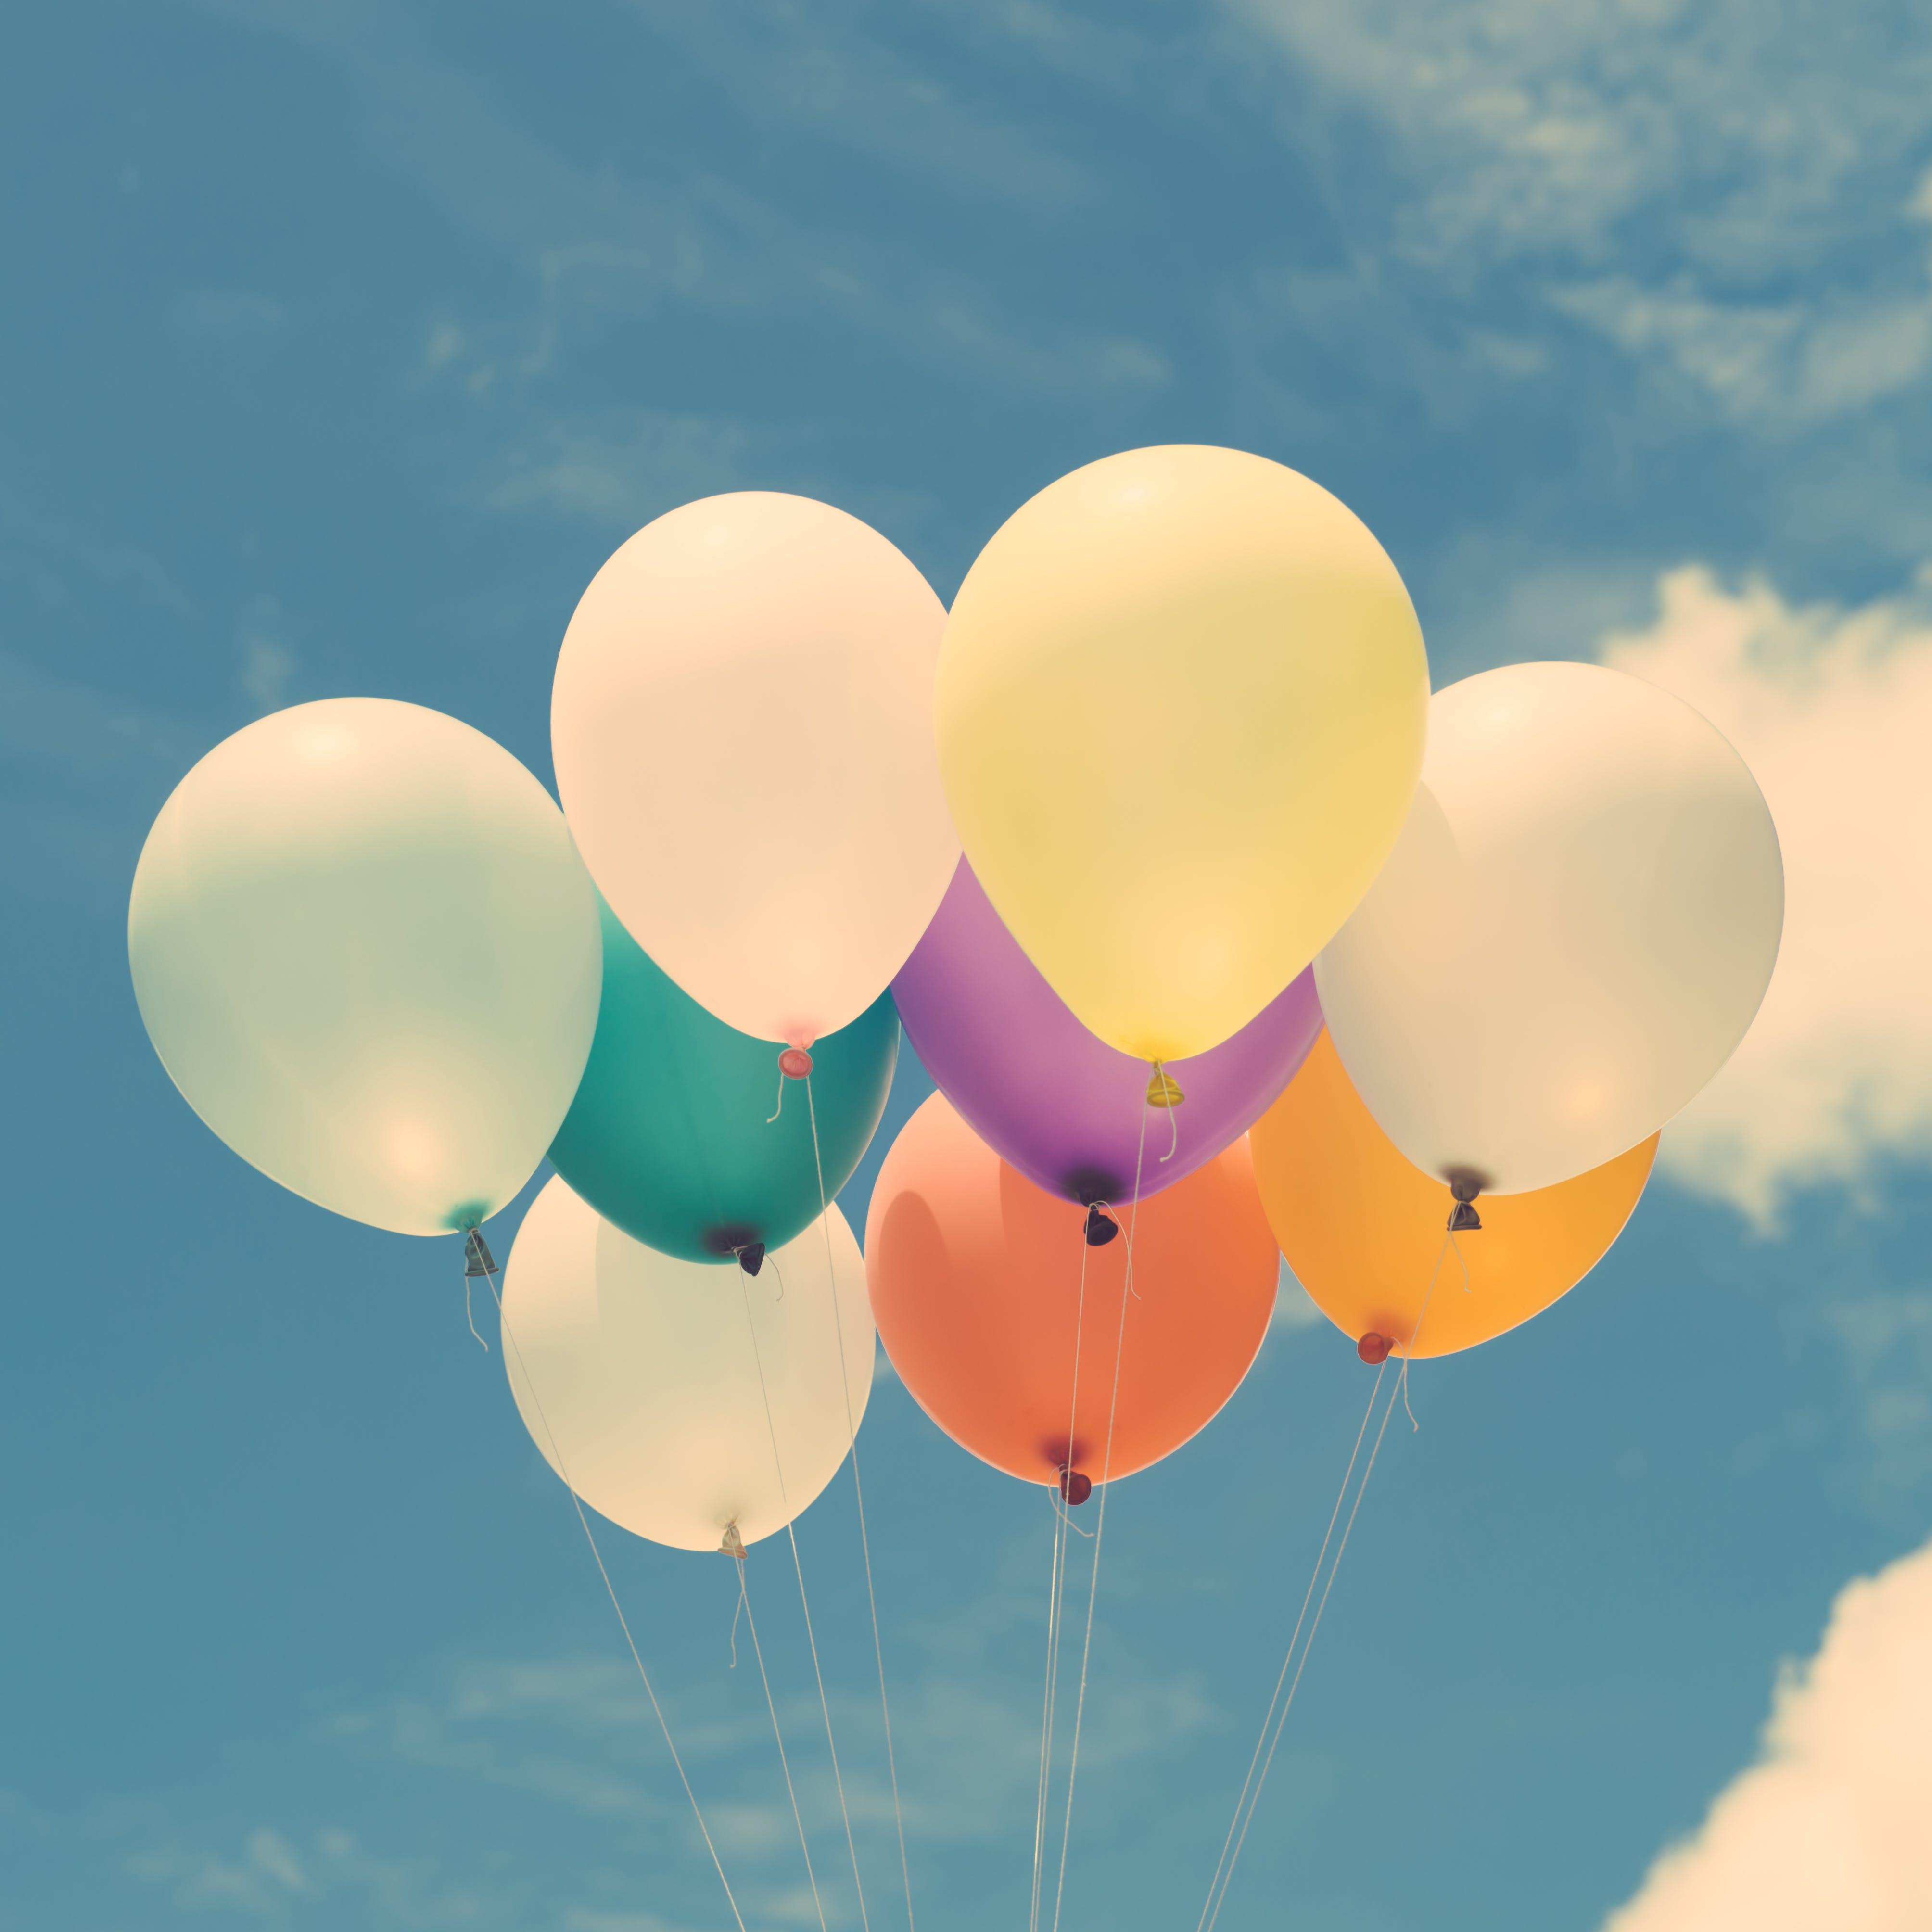 balloons, calm, clouds